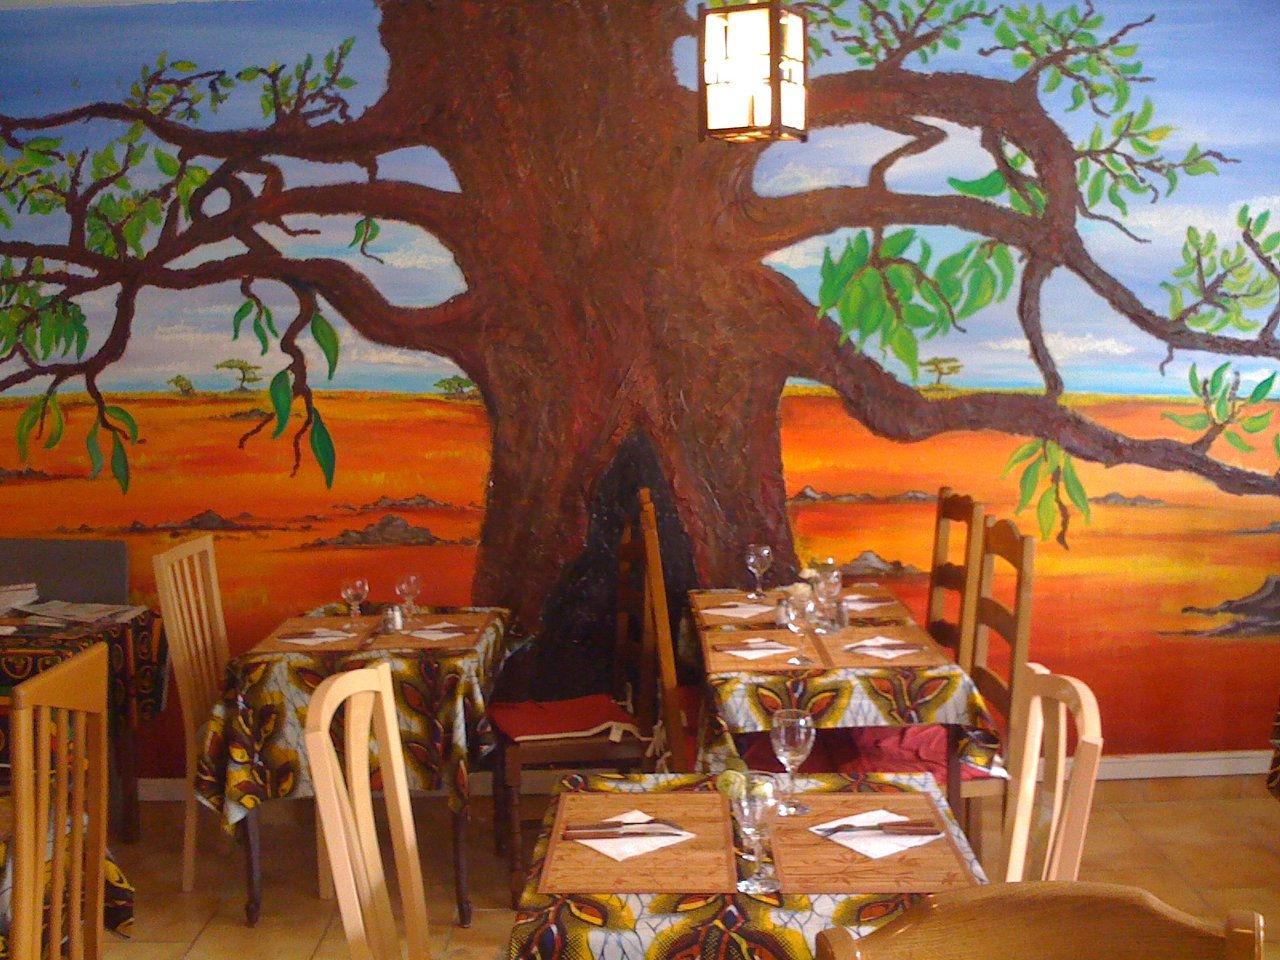 afridya restaurant africain anzin pr s de valenciennes. Black Bedroom Furniture Sets. Home Design Ideas